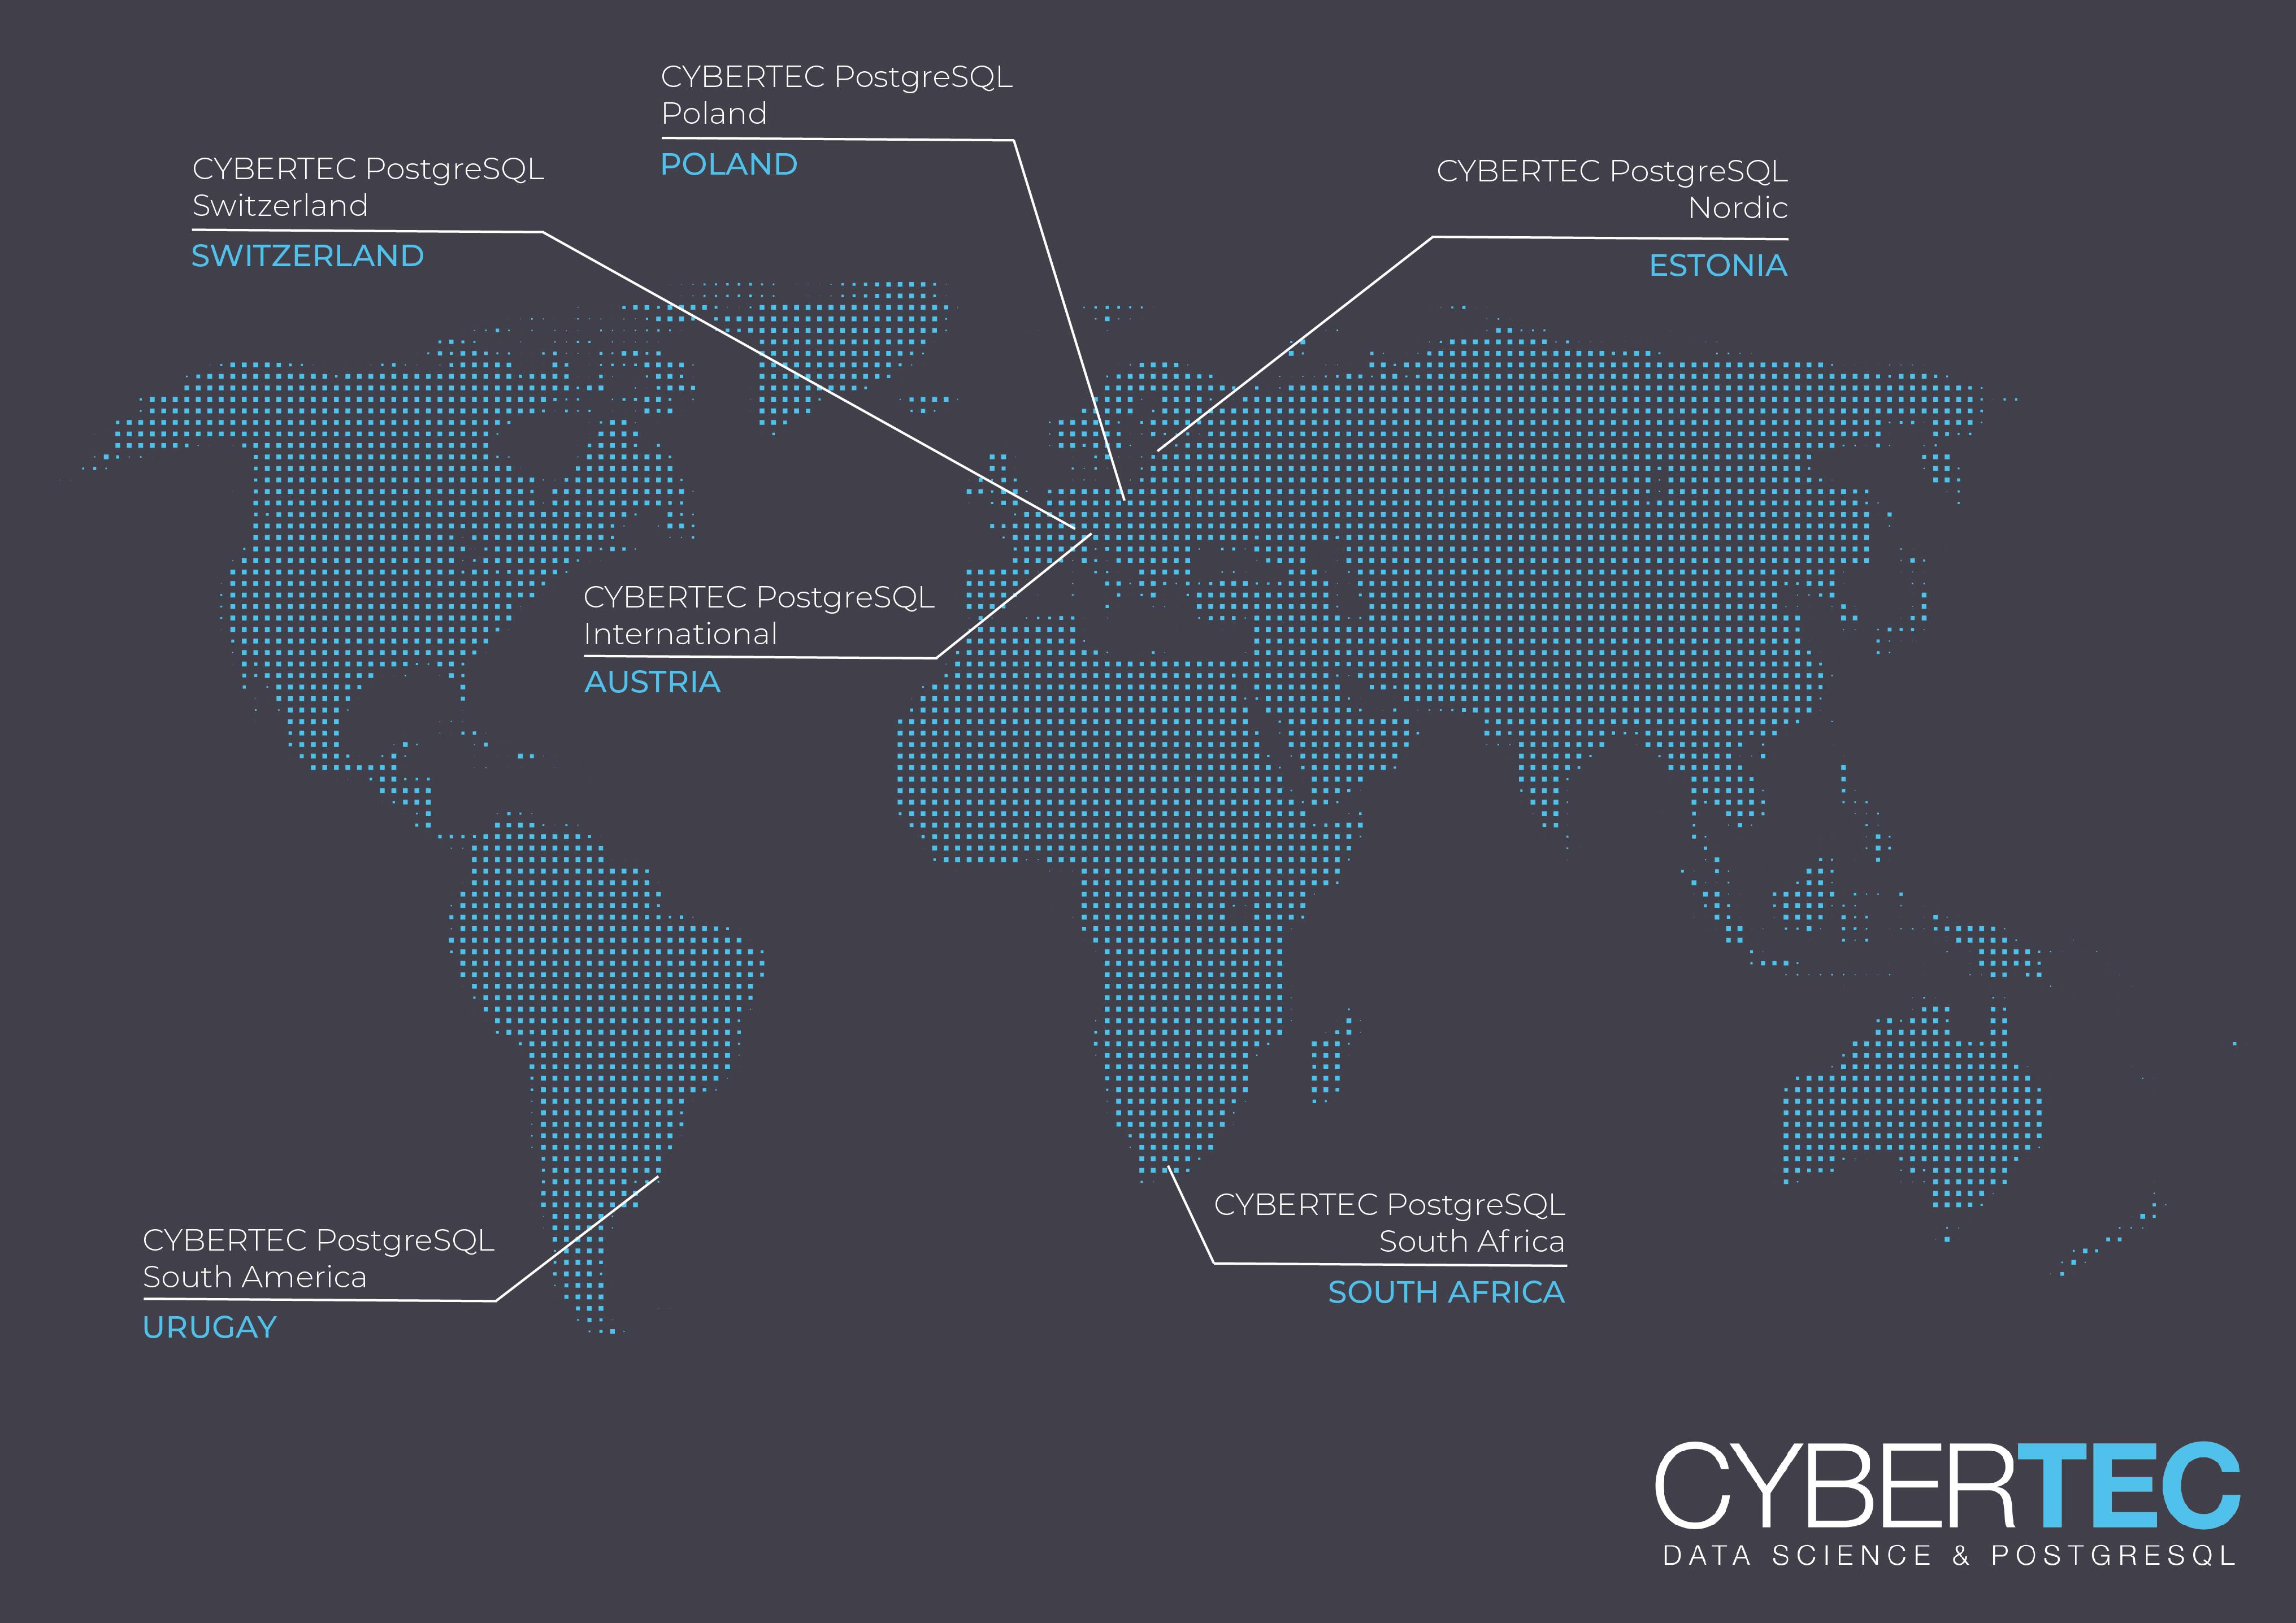 CYBERTEC offices around the world